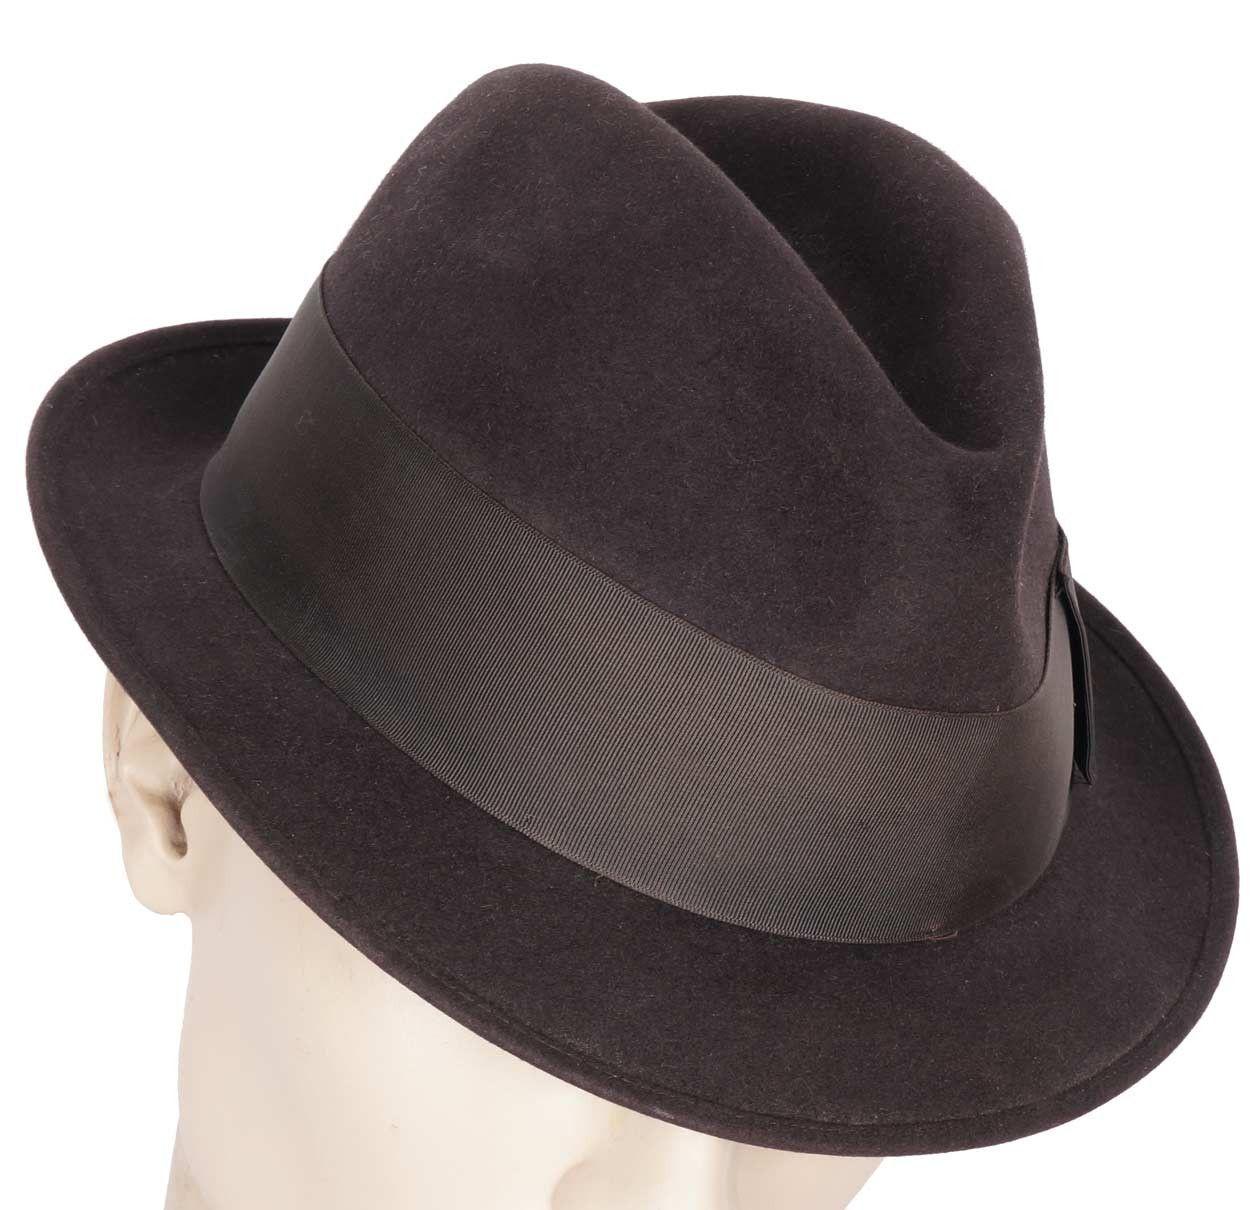 Vintage 1950s Stetson Twenty Fedora Hat Trilby Style Size Large 7 3 8  Trilby Hat 43220354c6f